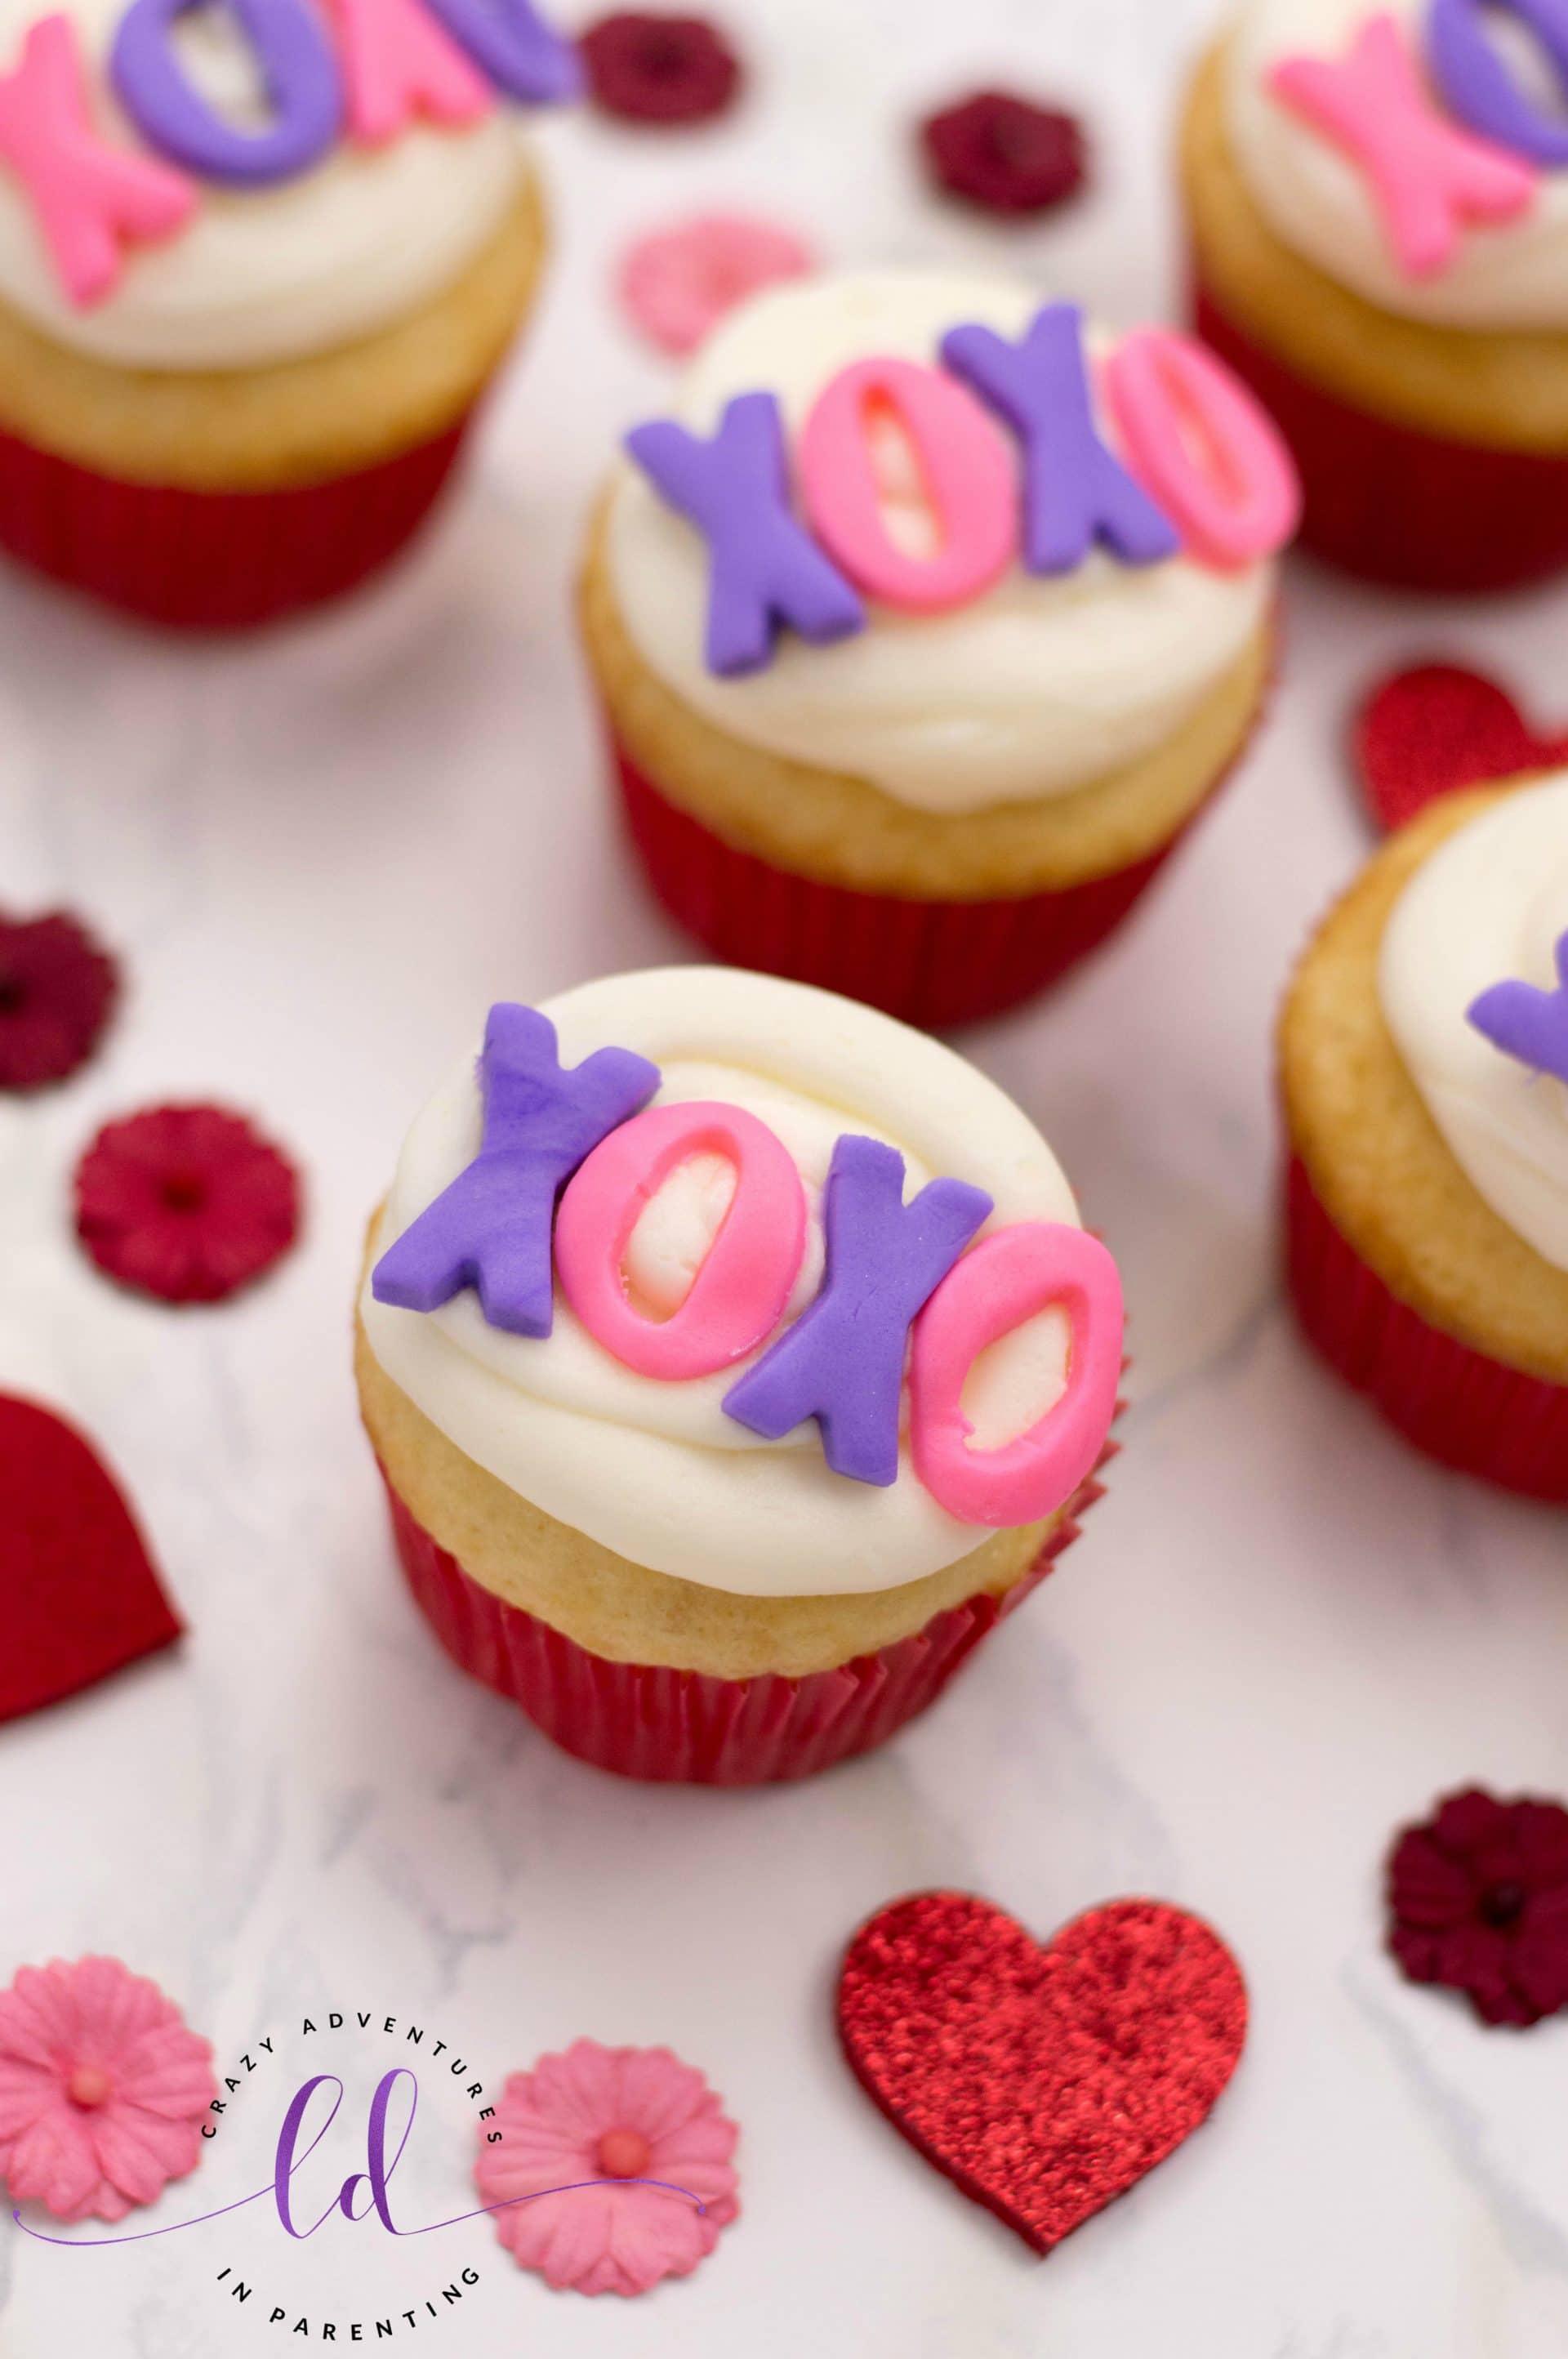 Vanilla XOXO Valentine's Cupcakes